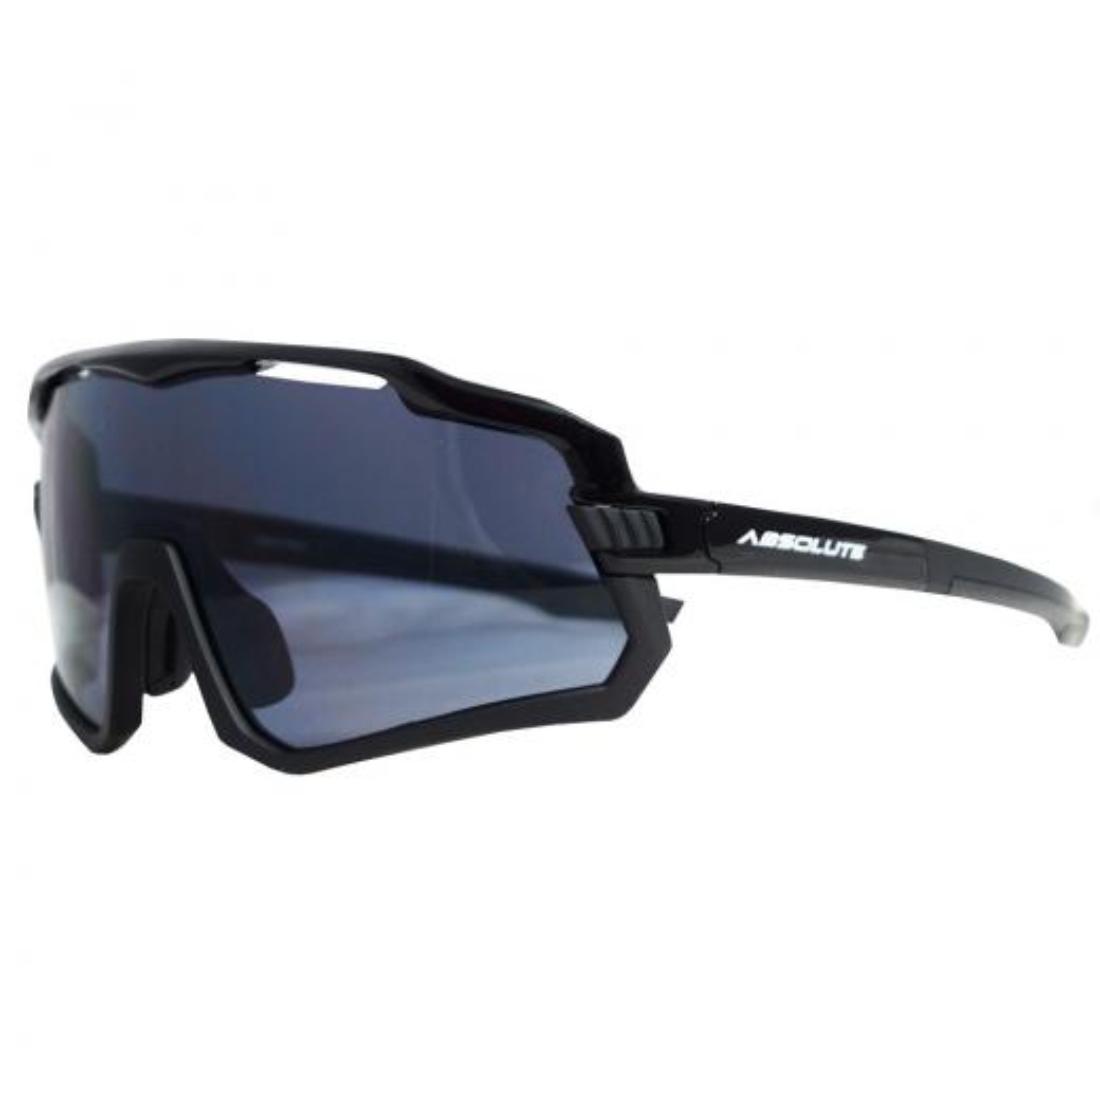 Óculos Absolute Prime Wild Mtb Preto Lente Fume Anti Uv 400